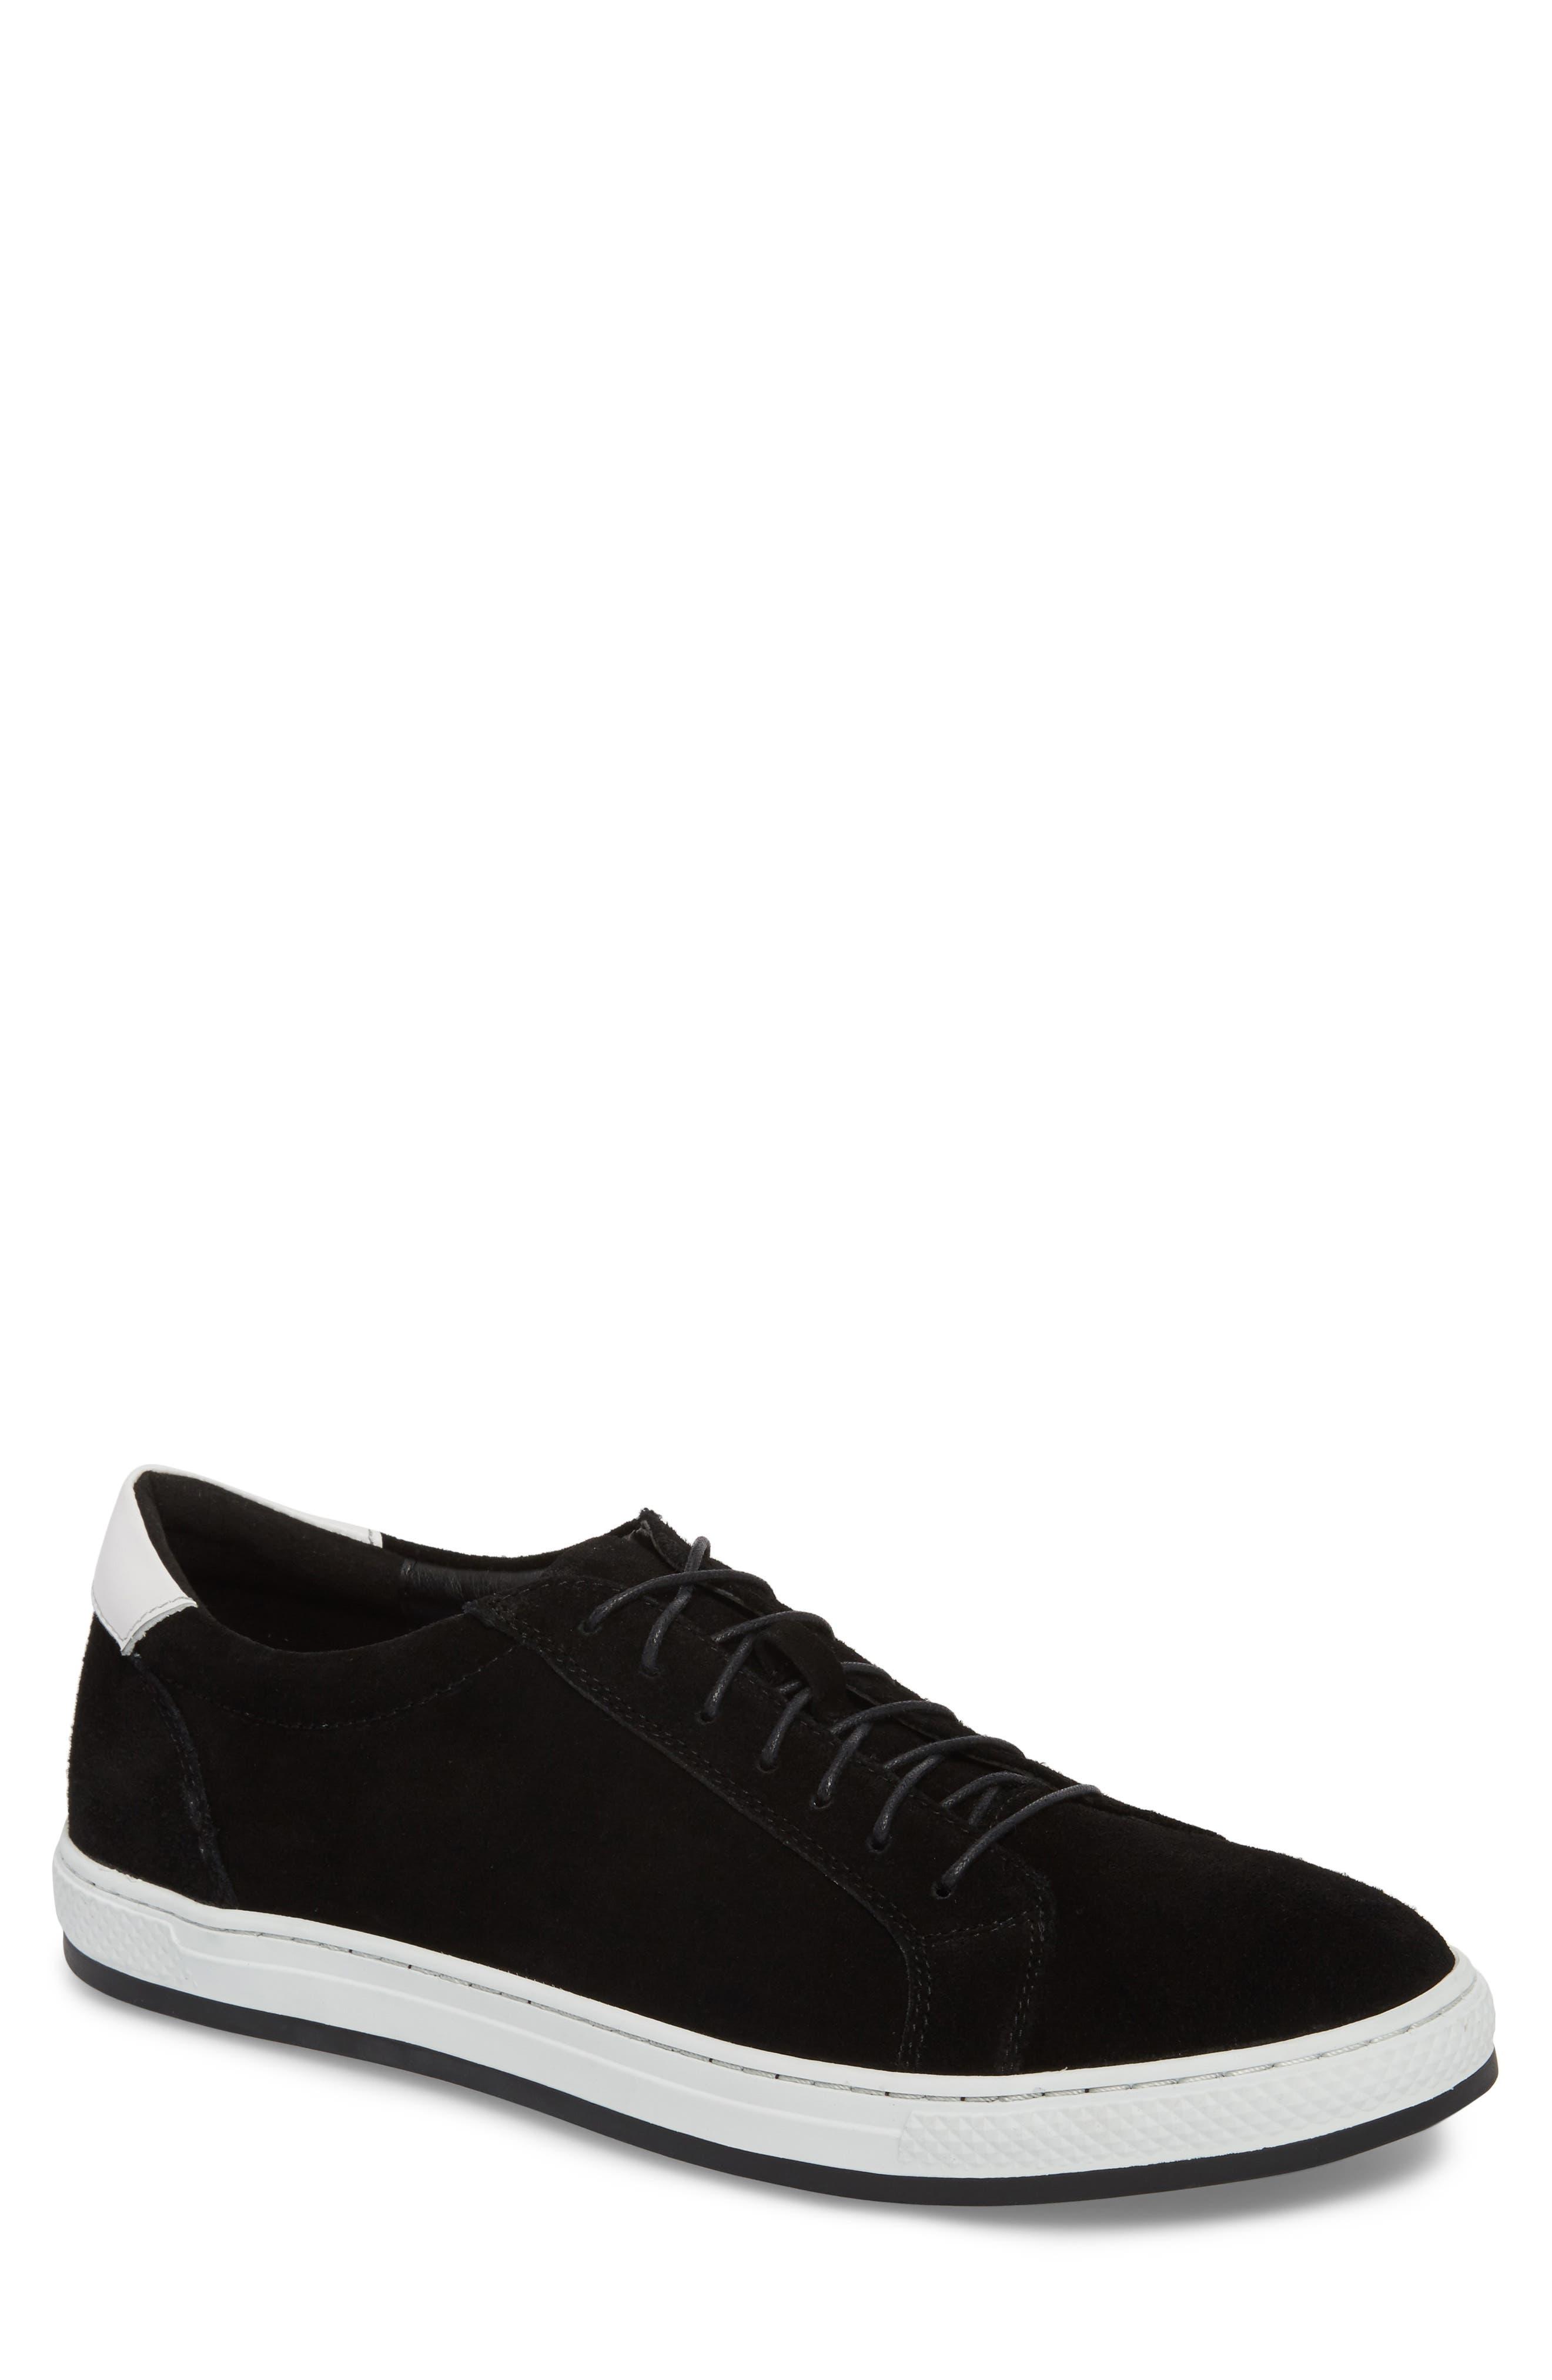 Queens Sneaker,                             Main thumbnail 1, color,                             001